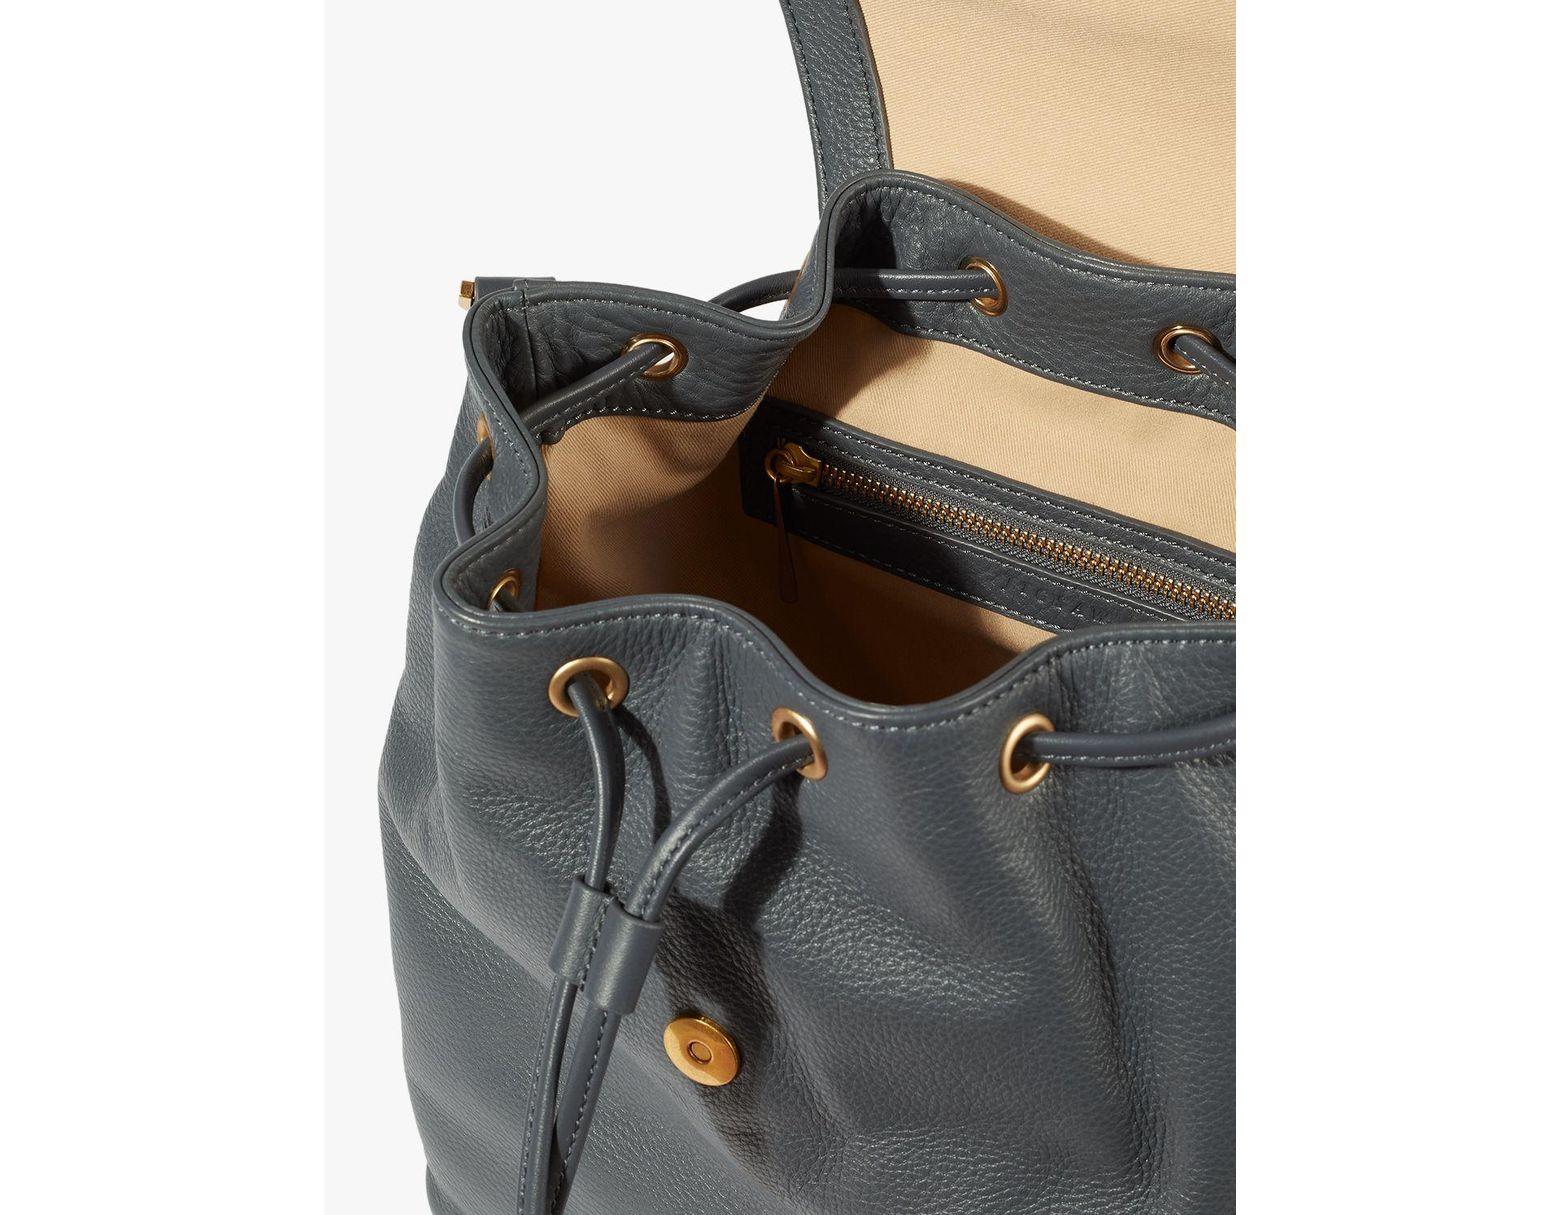 7bdc793de Jigsaw Brook 2-in-1 Leather Bag in Black - Lyst